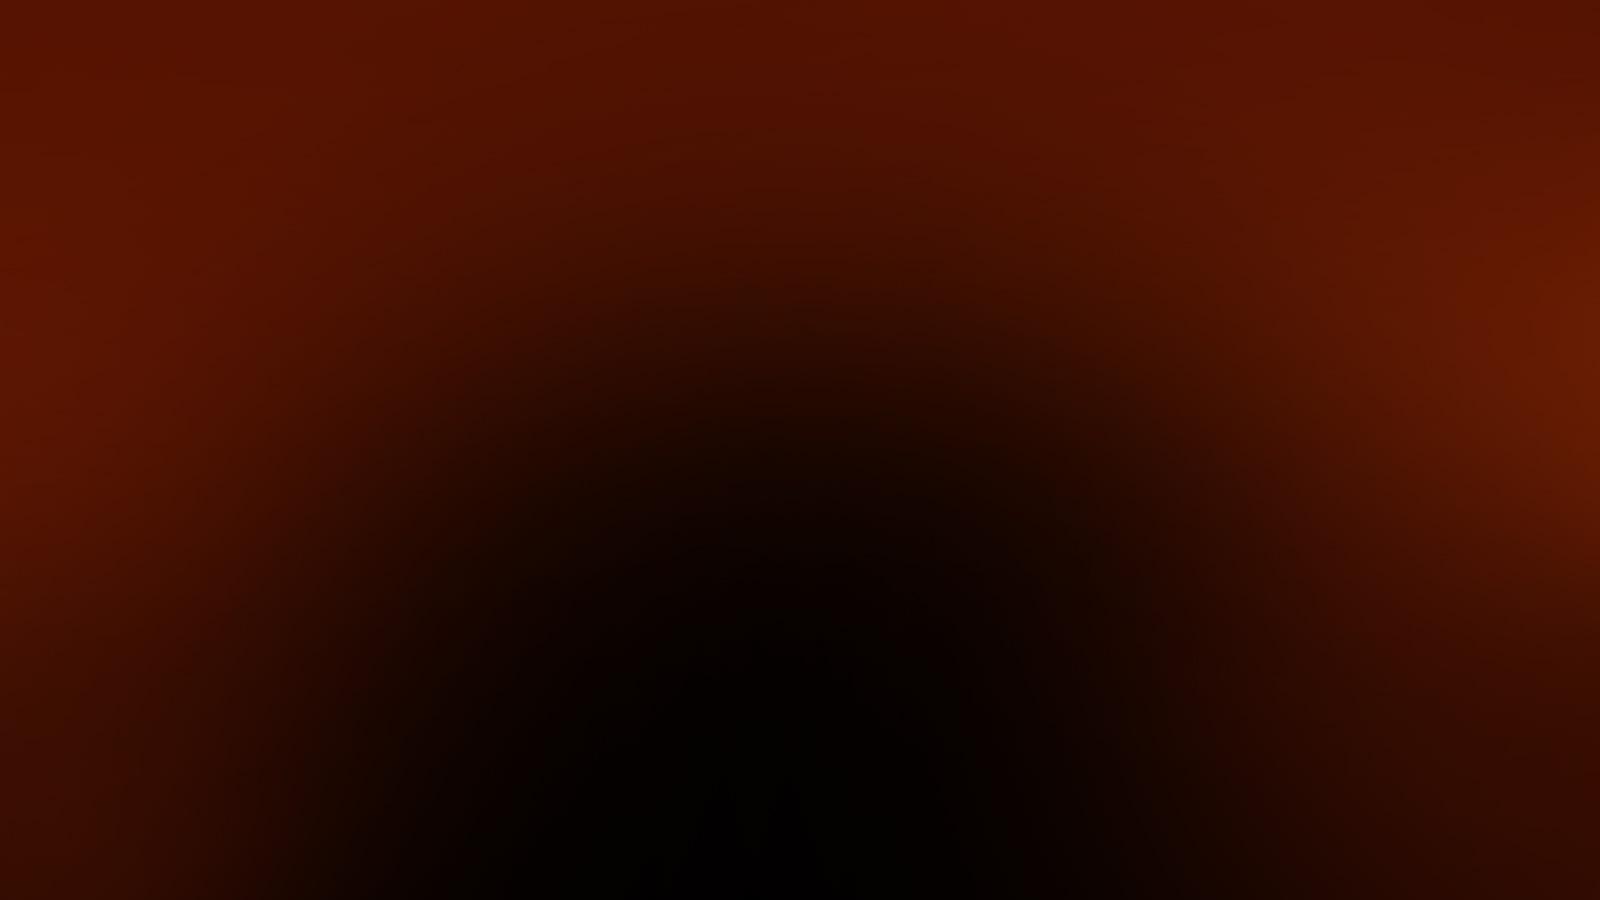 1603-zwart-dieprood-verloop